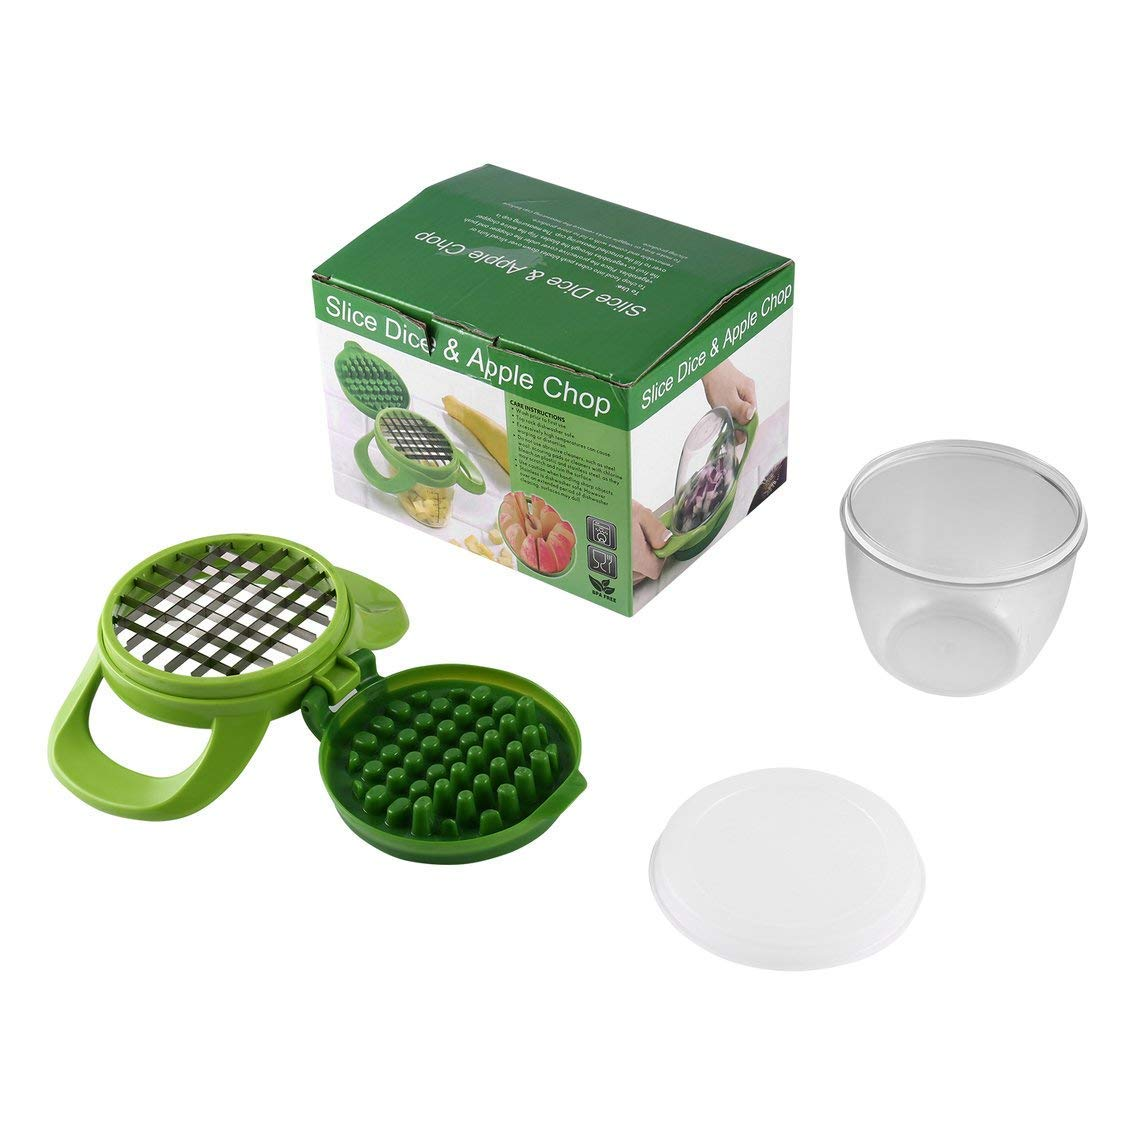 Mazur Food Onion Chopper Fruit & Vegetables Slice Dice Chop Machine Potato Dicer DIY Salad Easy Clean Slicer Fruit & Vegetable Tools(Green)